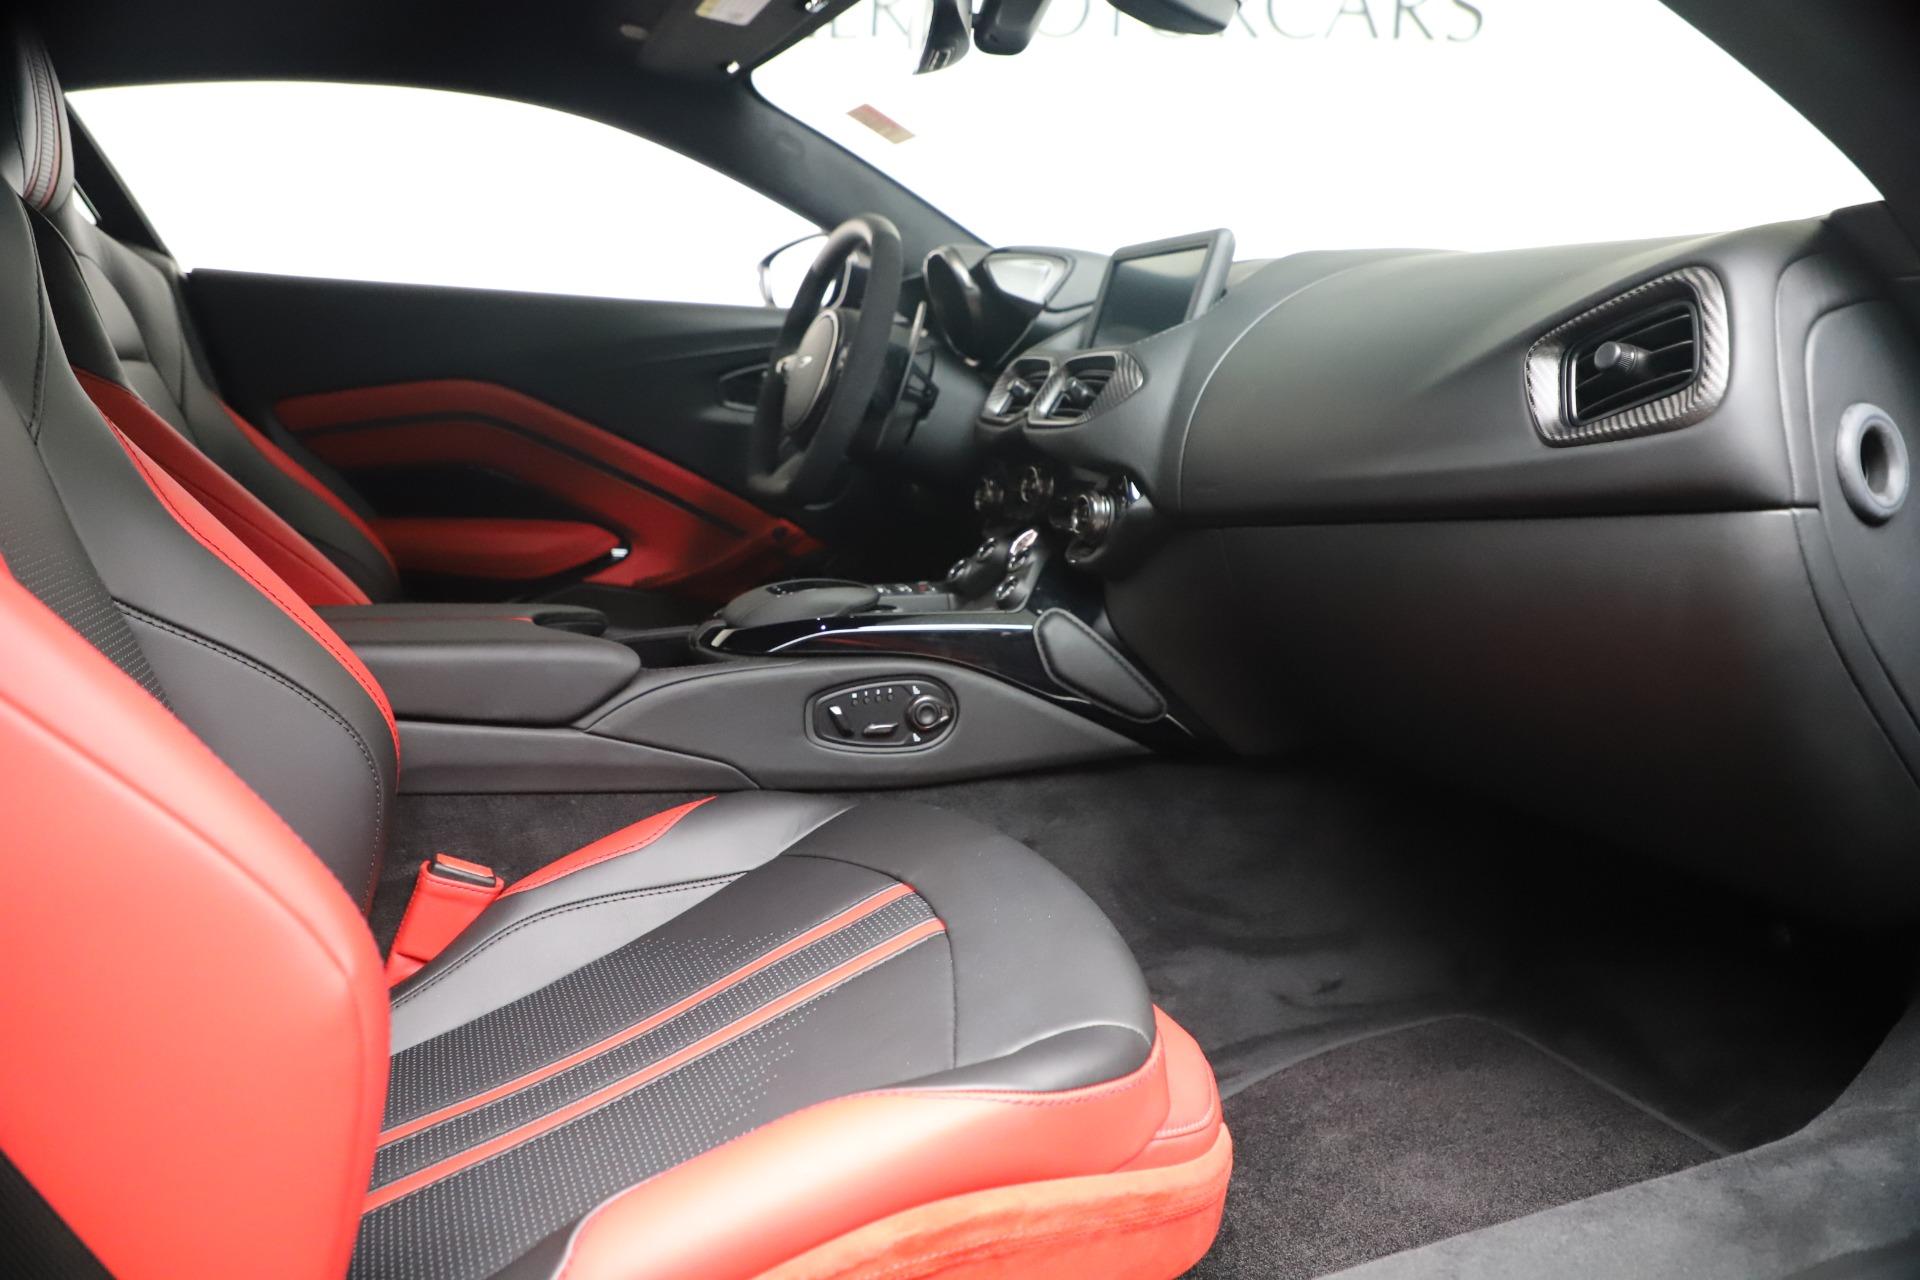 New 2020 Aston Martin Vantage V8 For Sale In Westport, CT 3547_p18